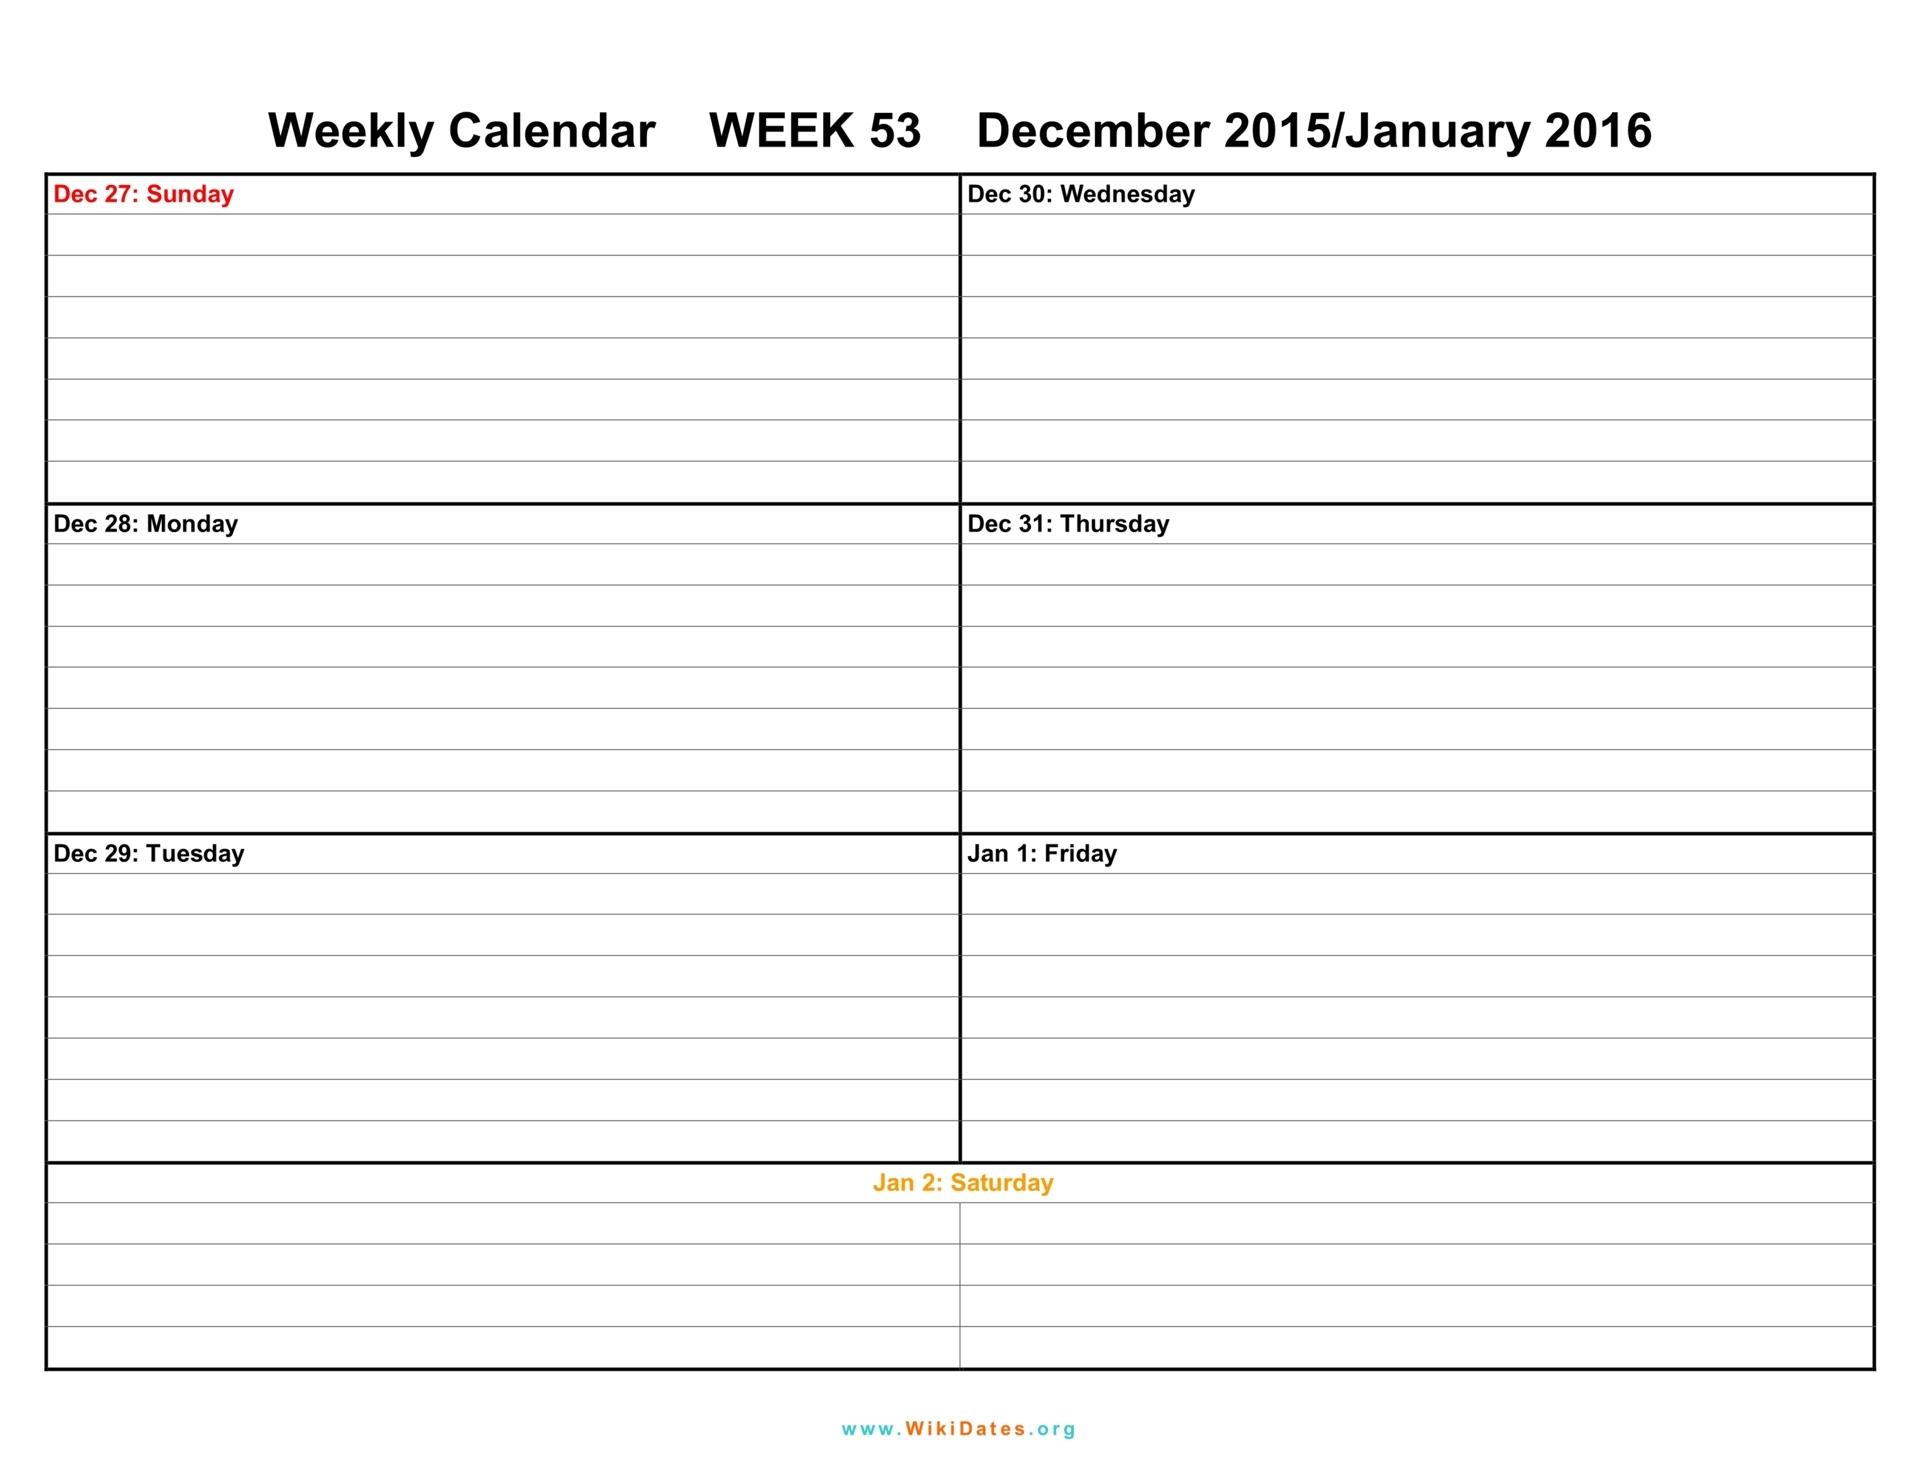 019 Template Ideas Free Printable Daily Calendar With Time throughout Weekly Calendar With Time Slots Pdf